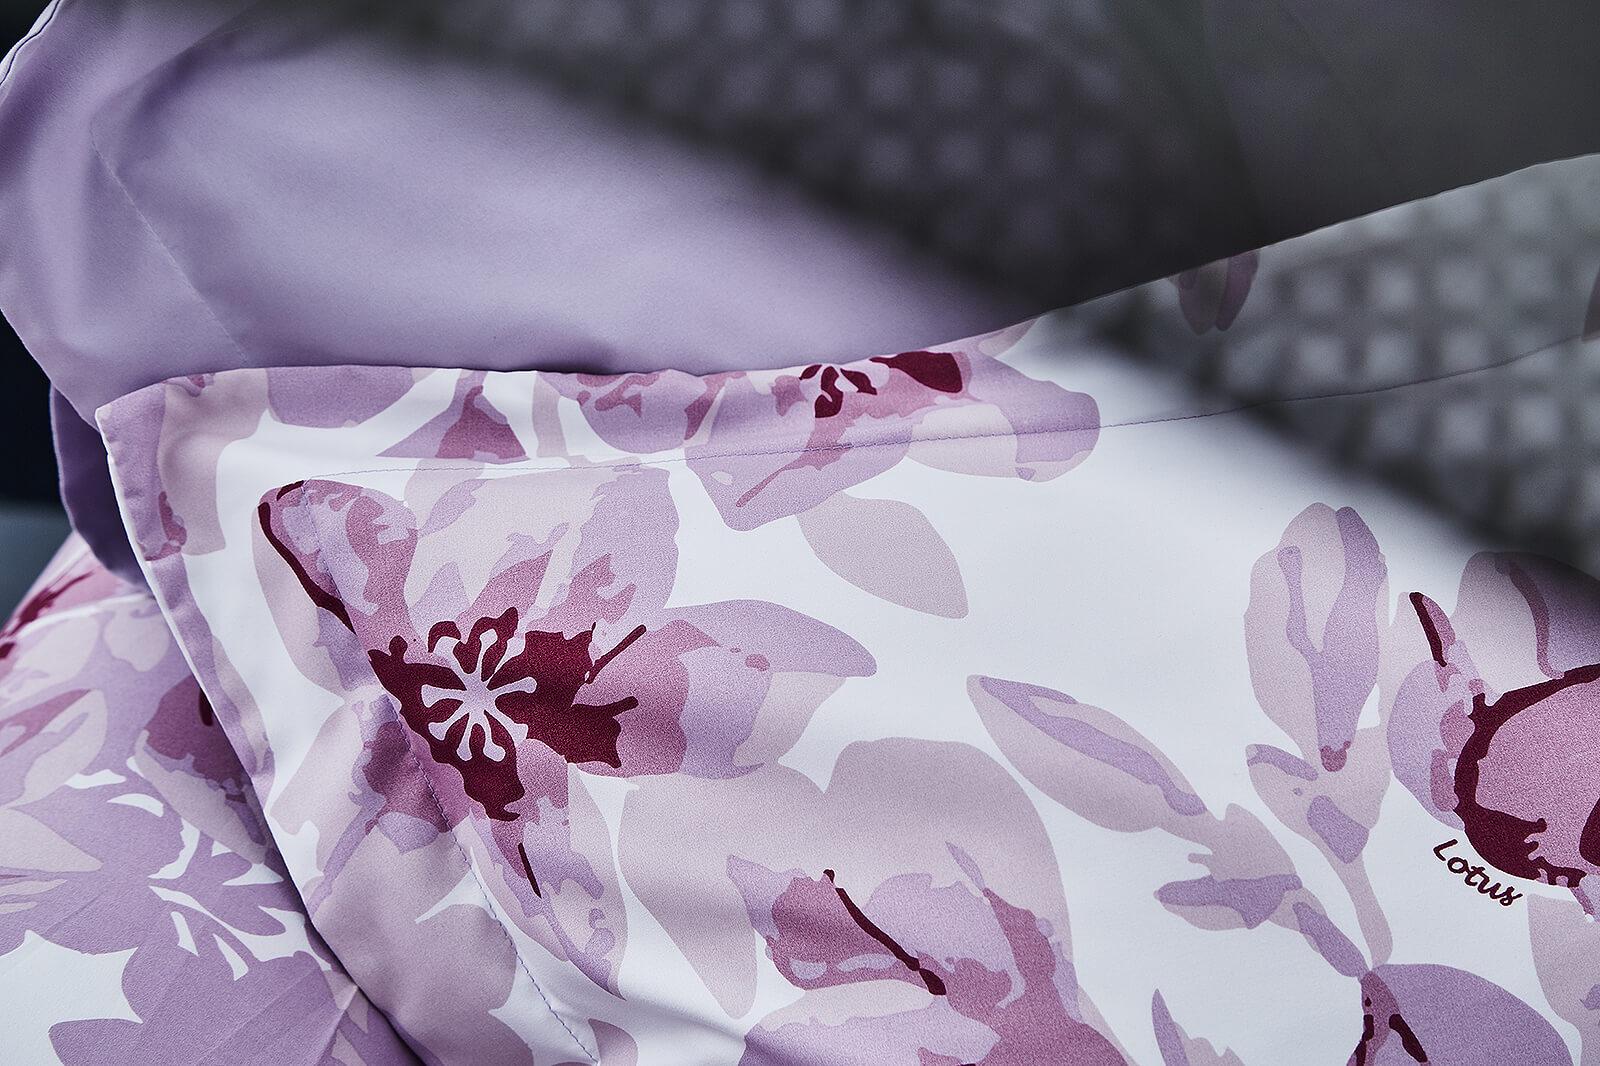 Lotus Impression Print LI-065